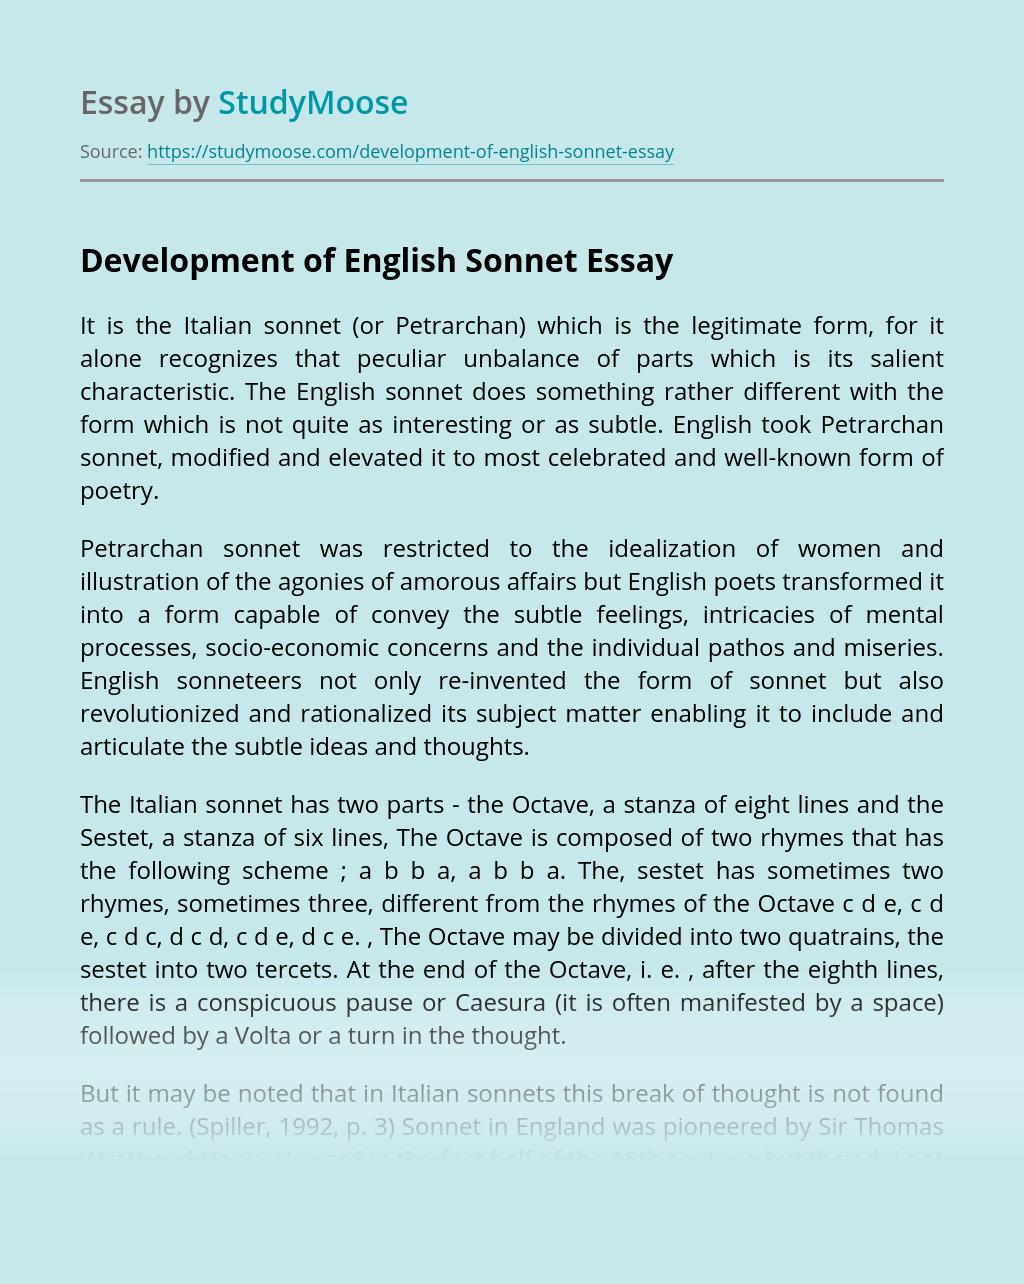 Development of English Sonnet